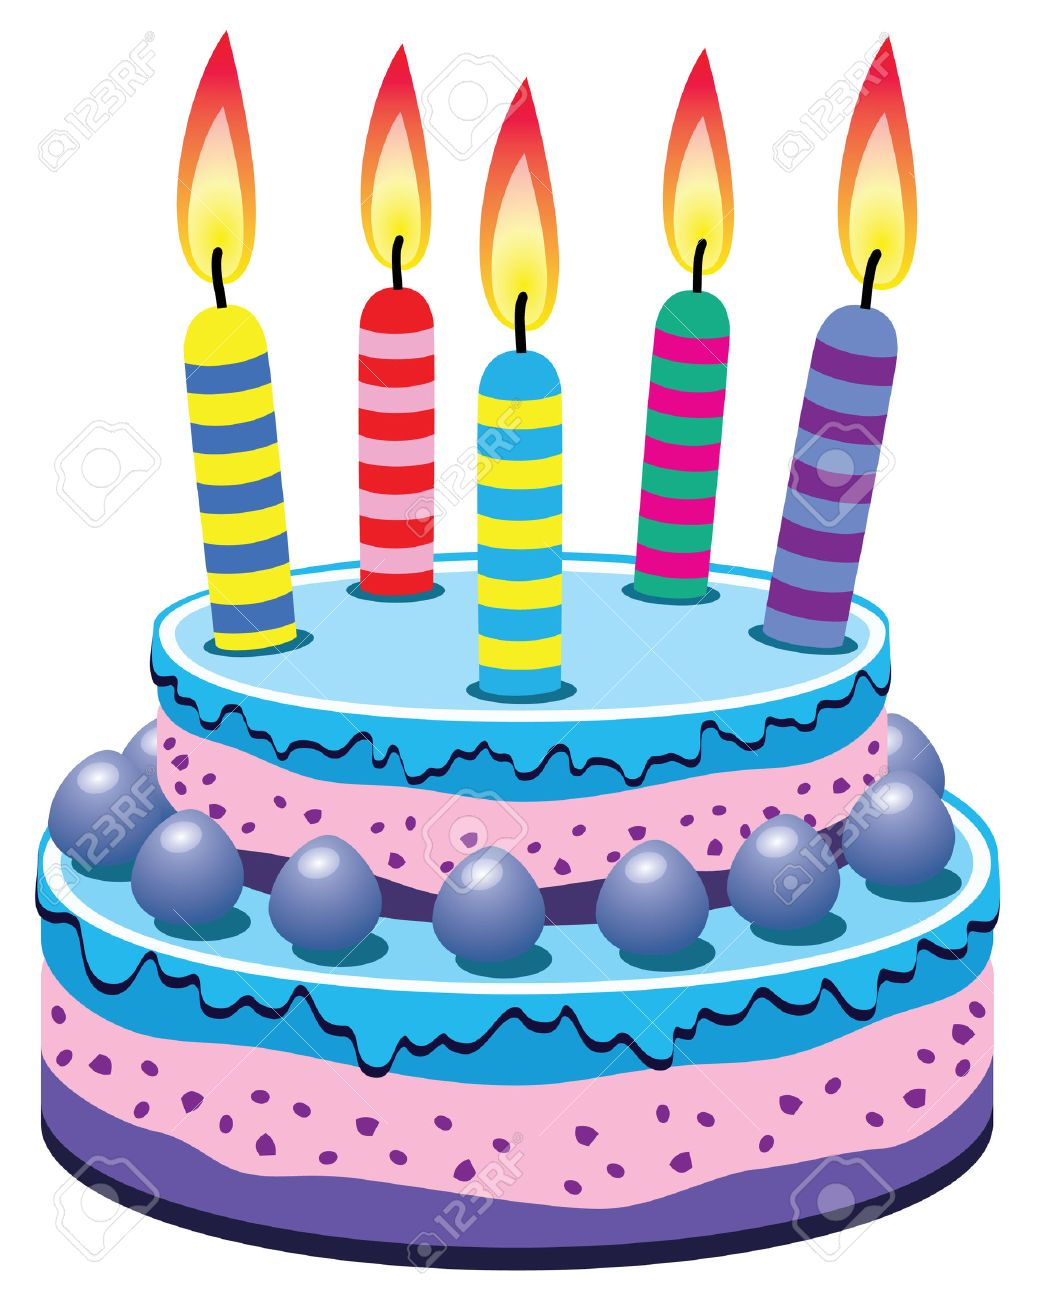 Birthday Cake Stock Photos Pictures Royalty Free Birthday Cake